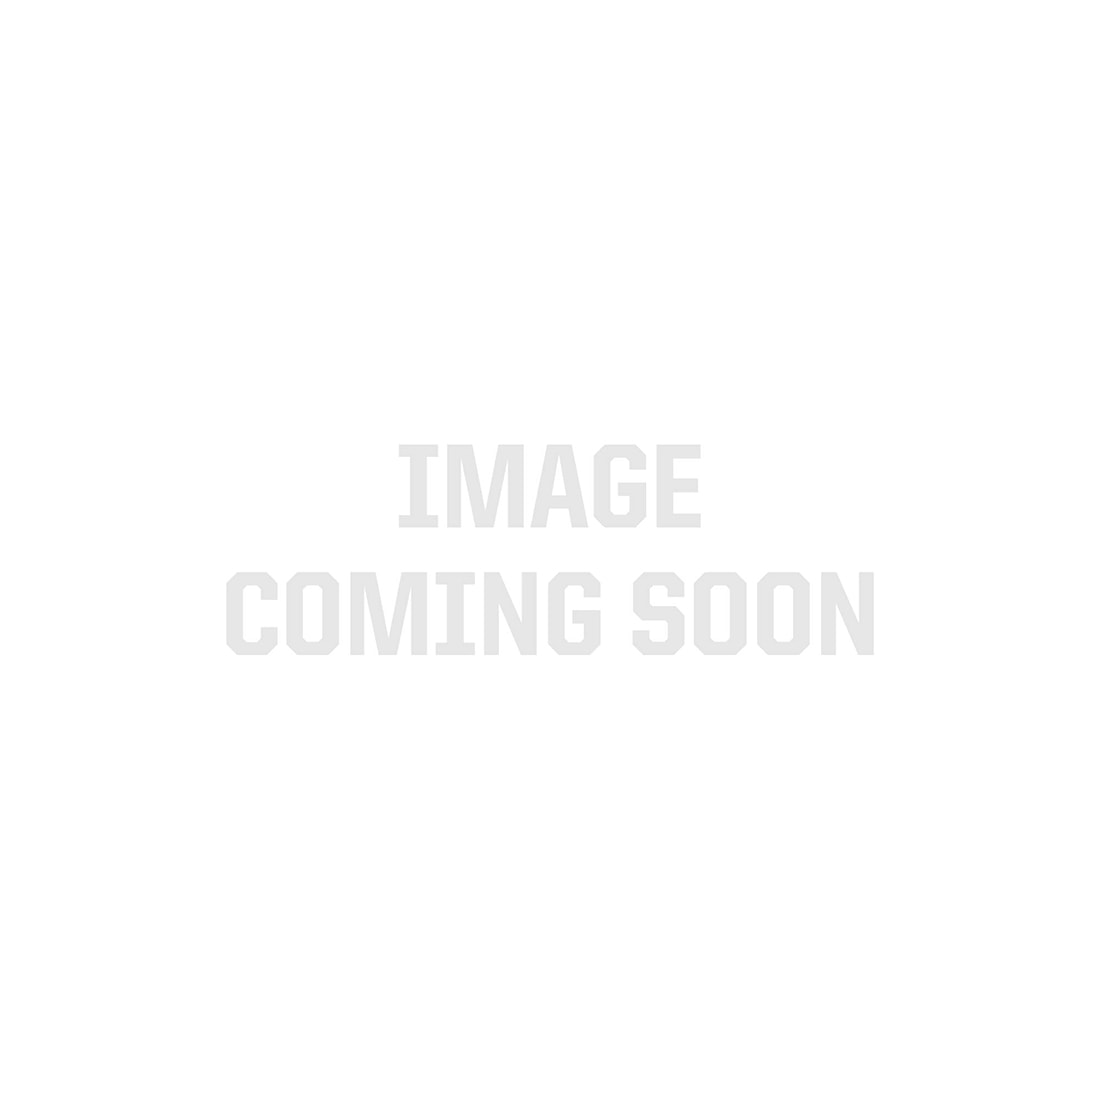 Blue 3528 Single Row LED Strip Light, 120/m, 10mm wide, Sample Kit